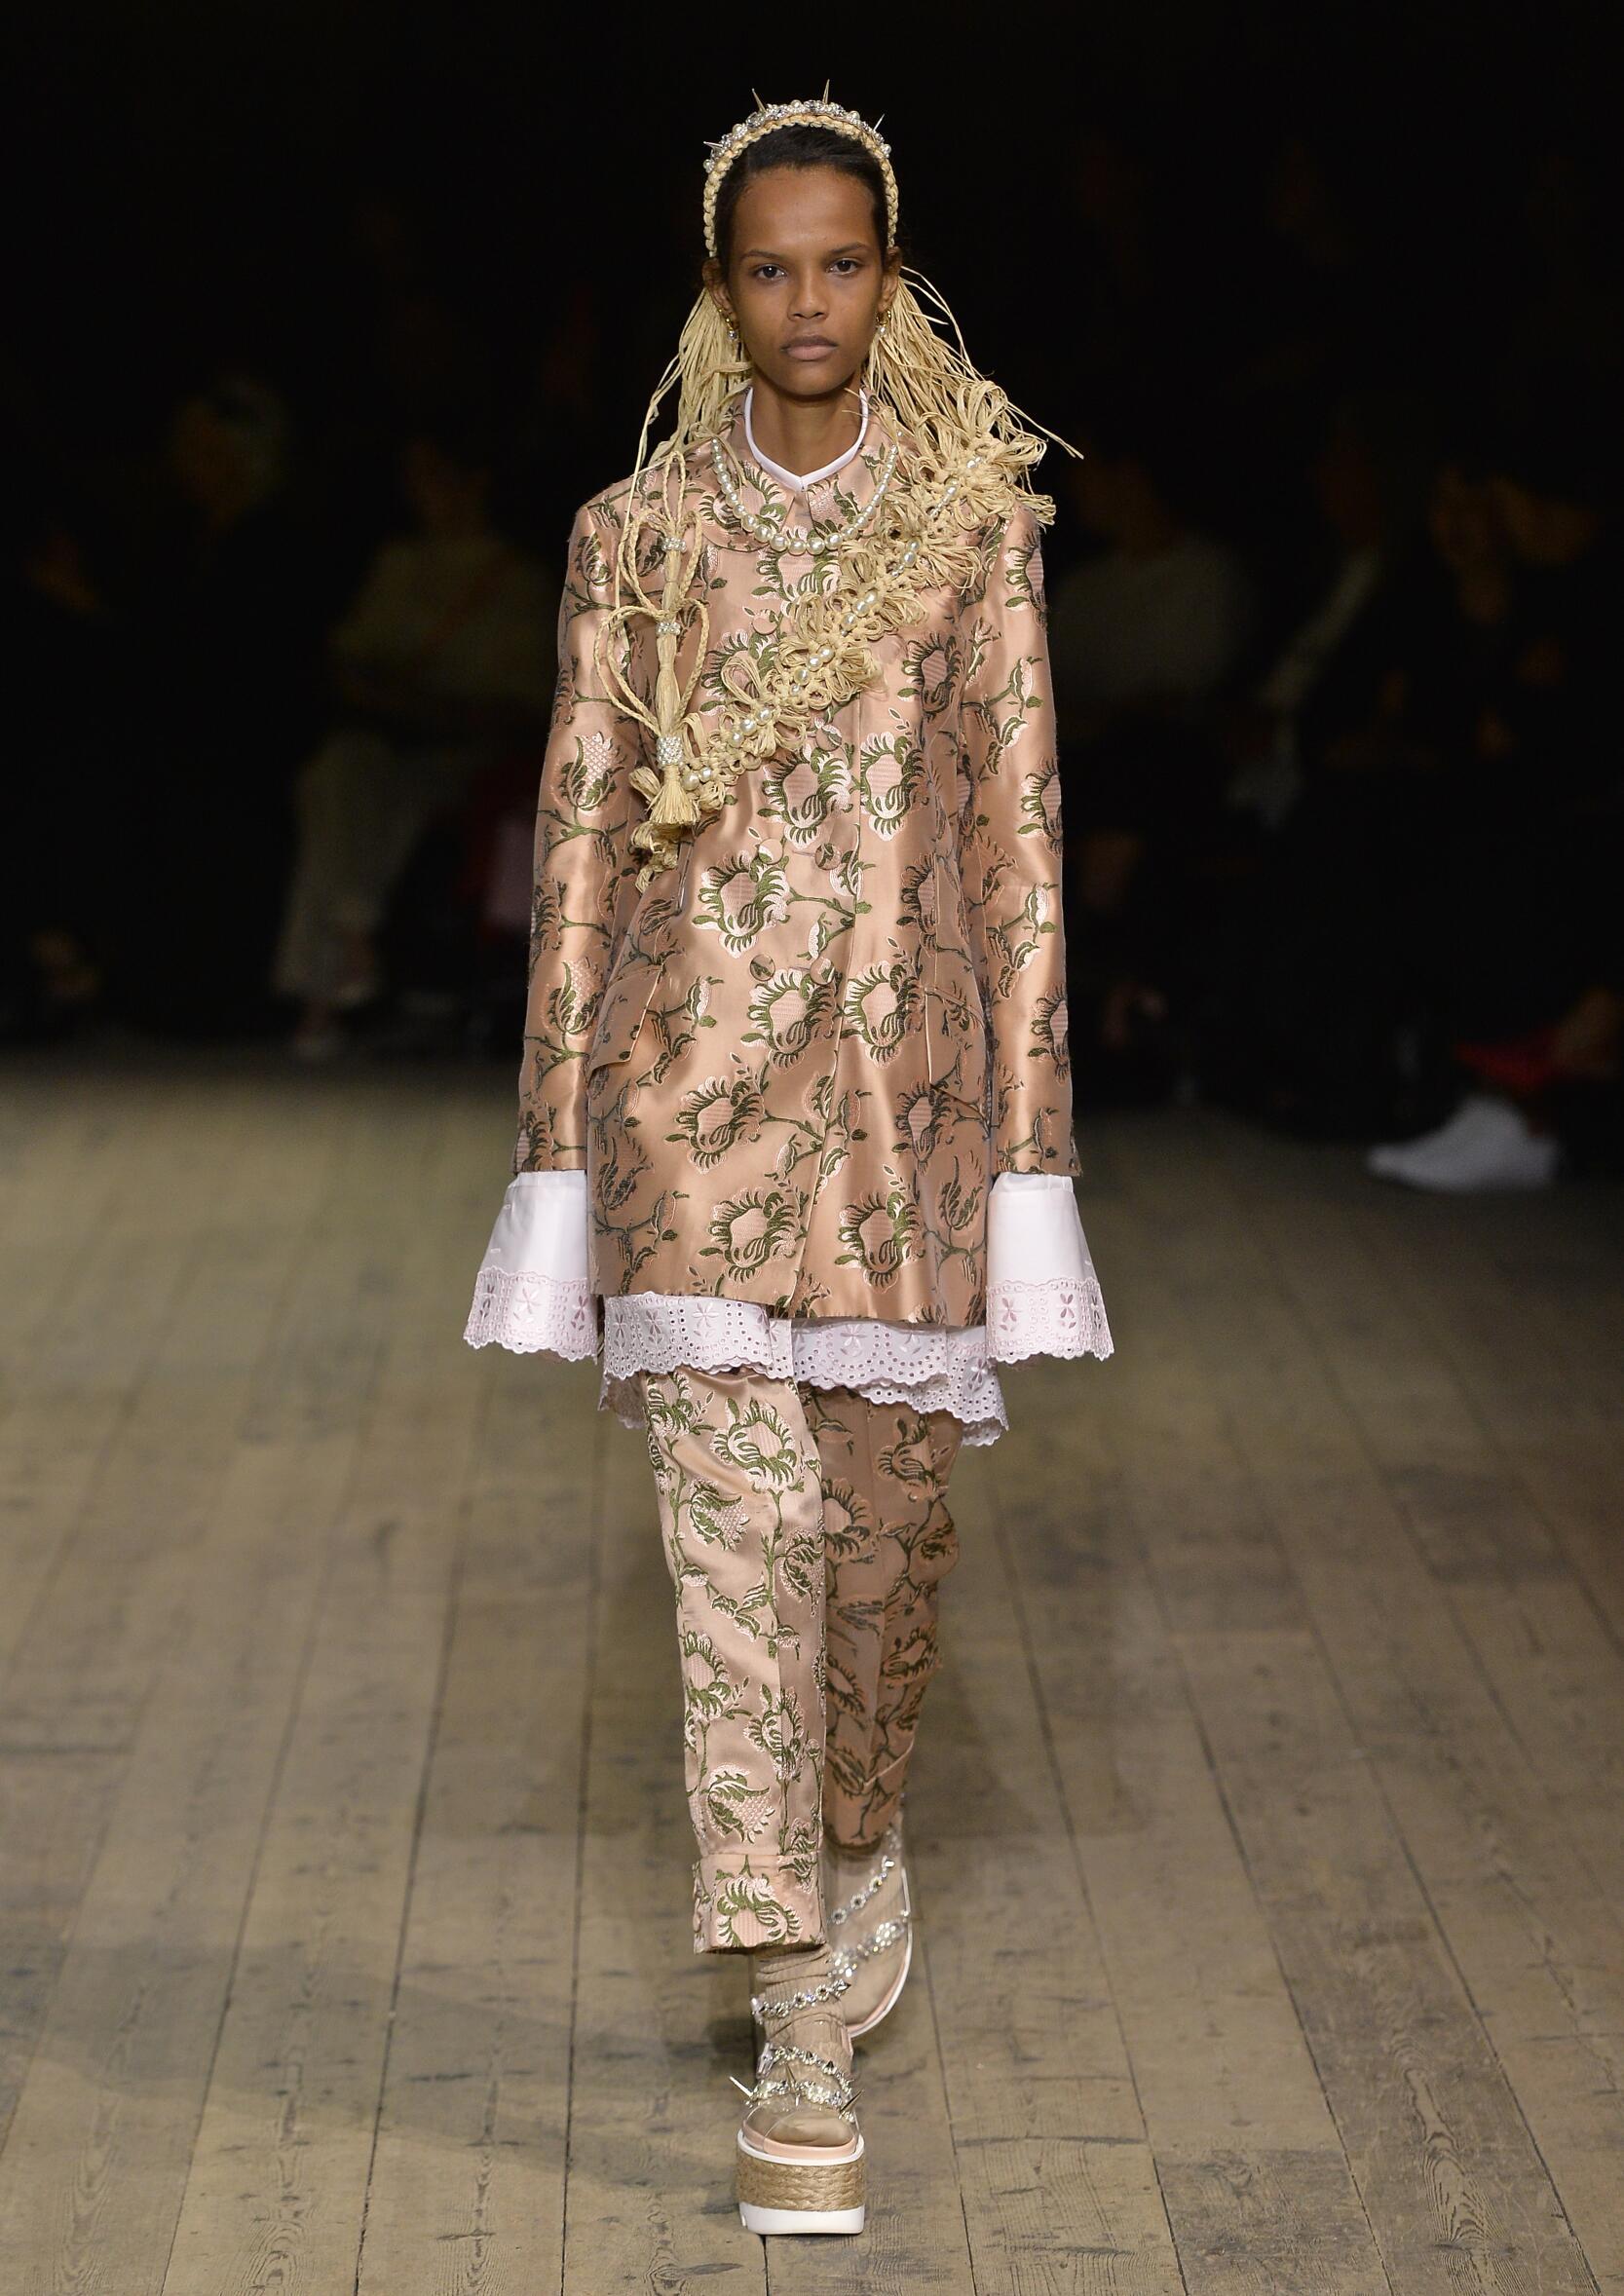 Fashion Model Simone Rocha Catwalk